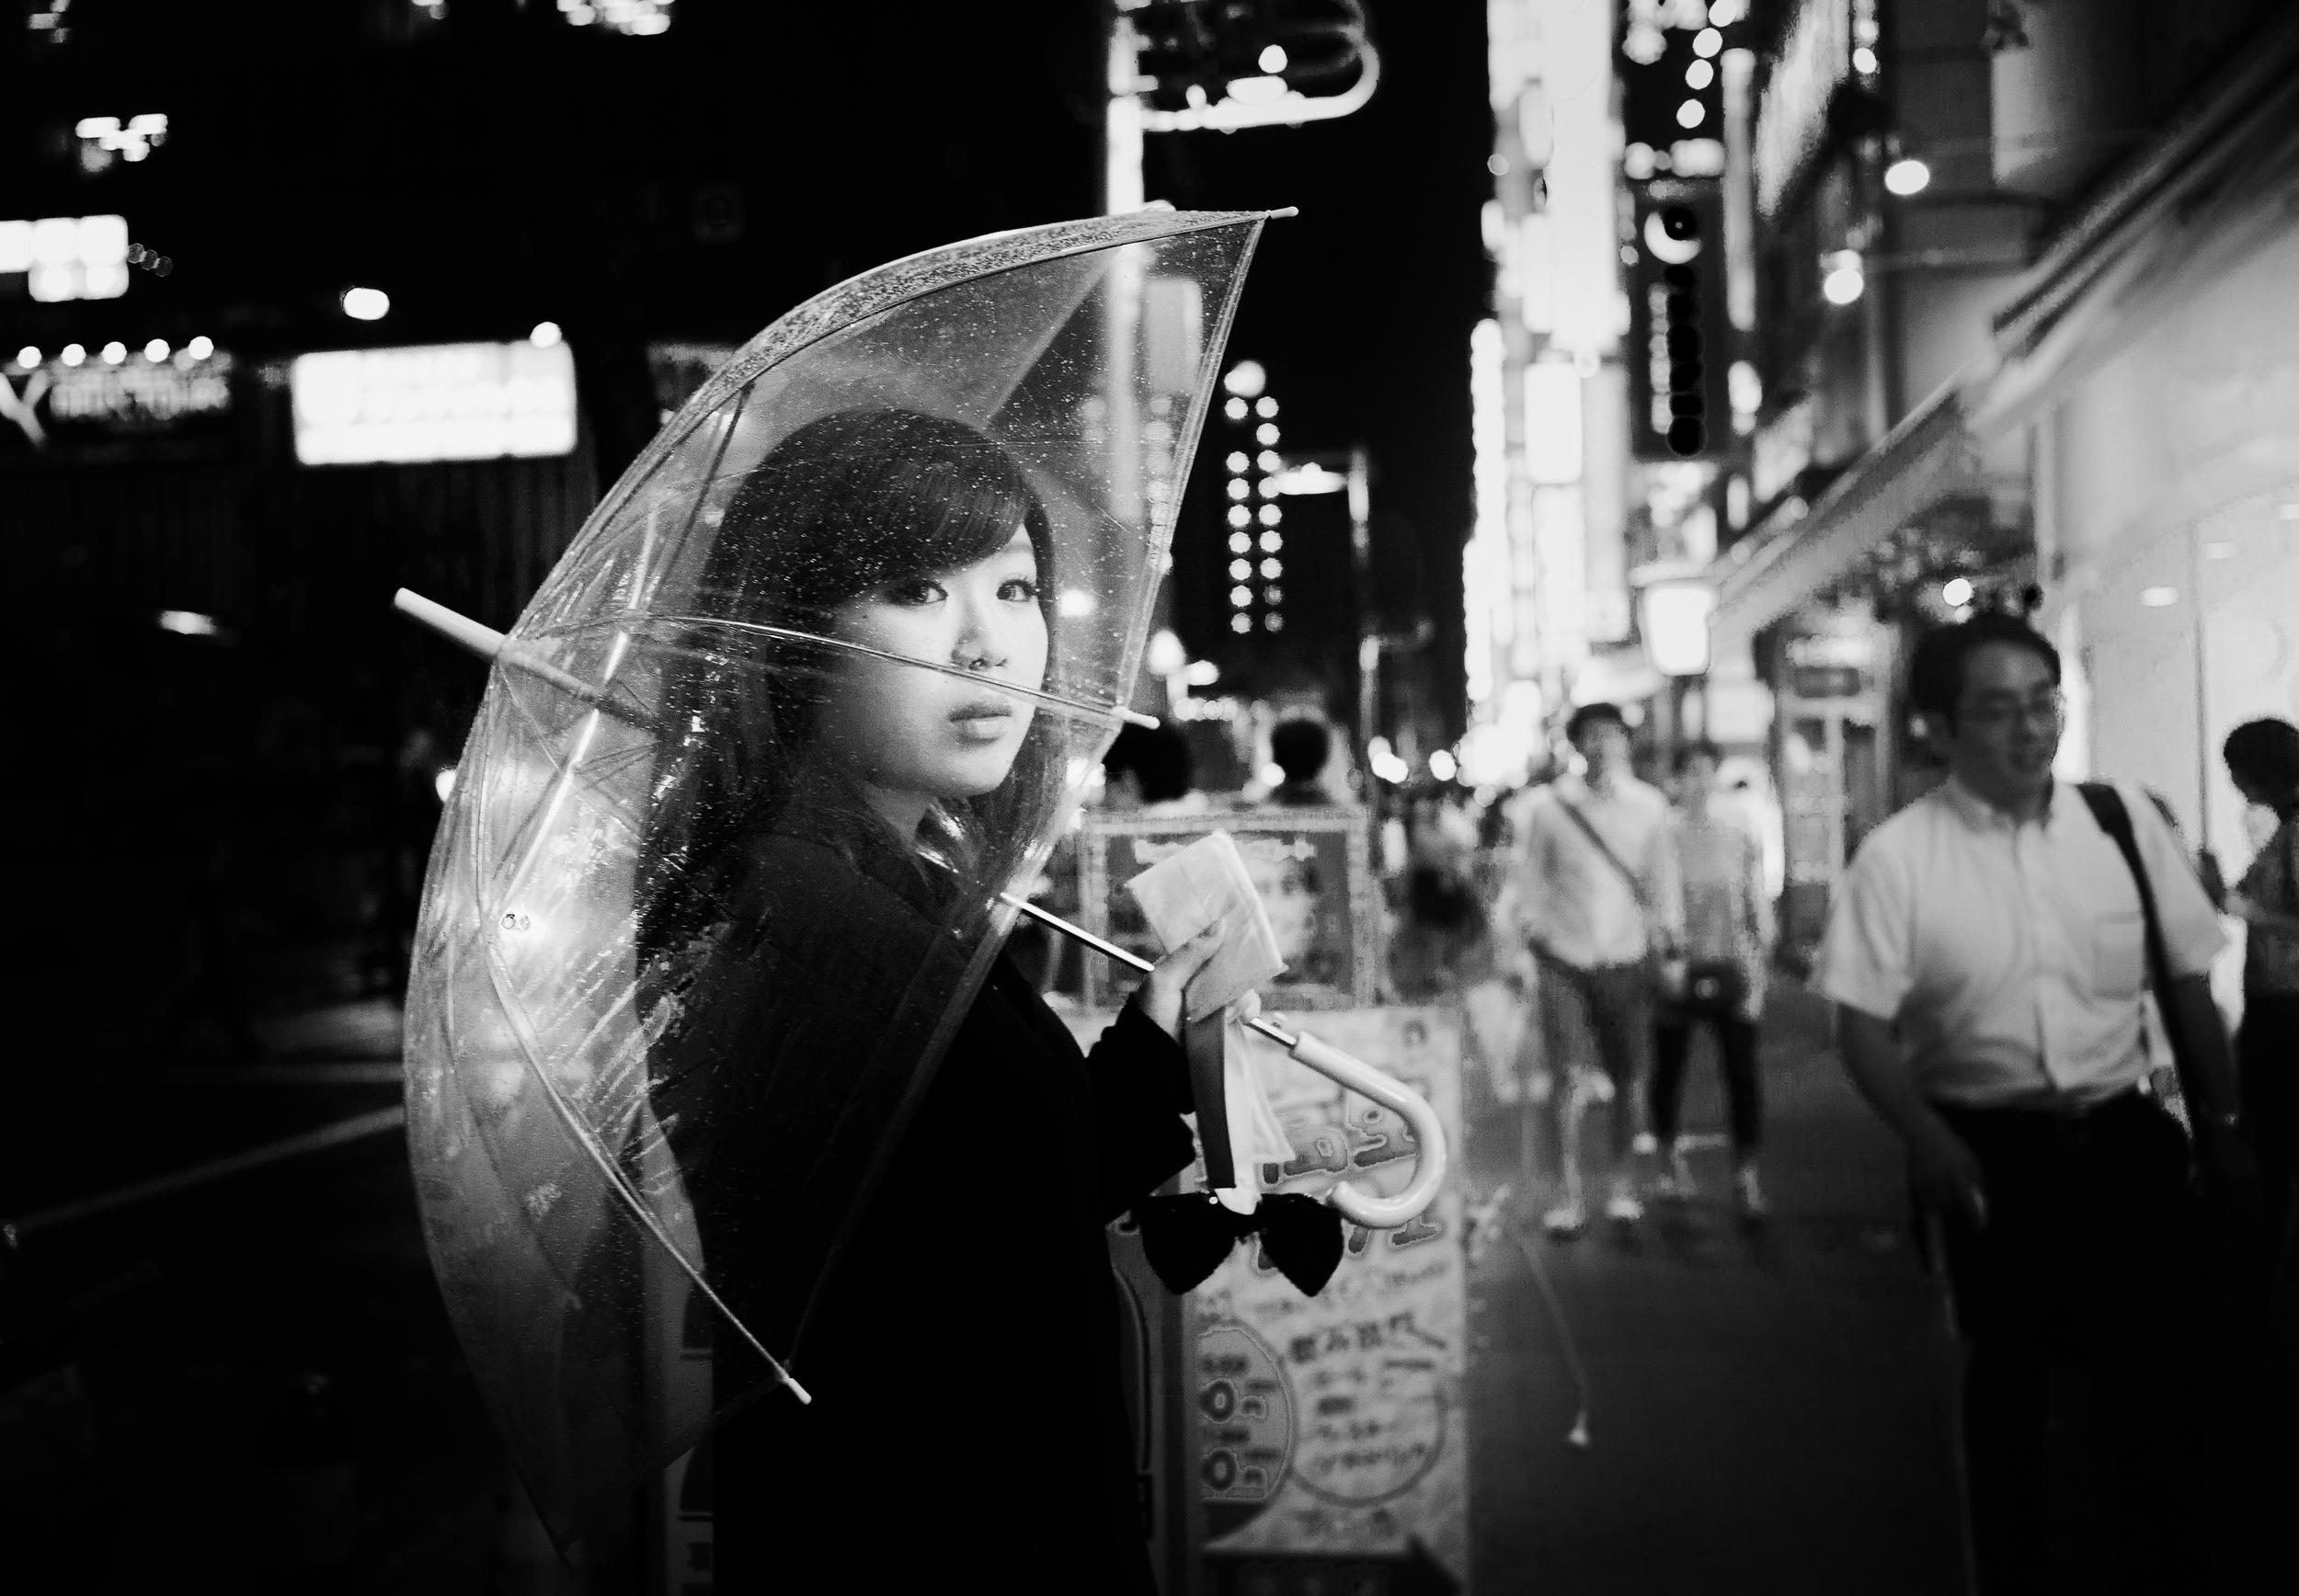 A story of women, Tokyo, 2014